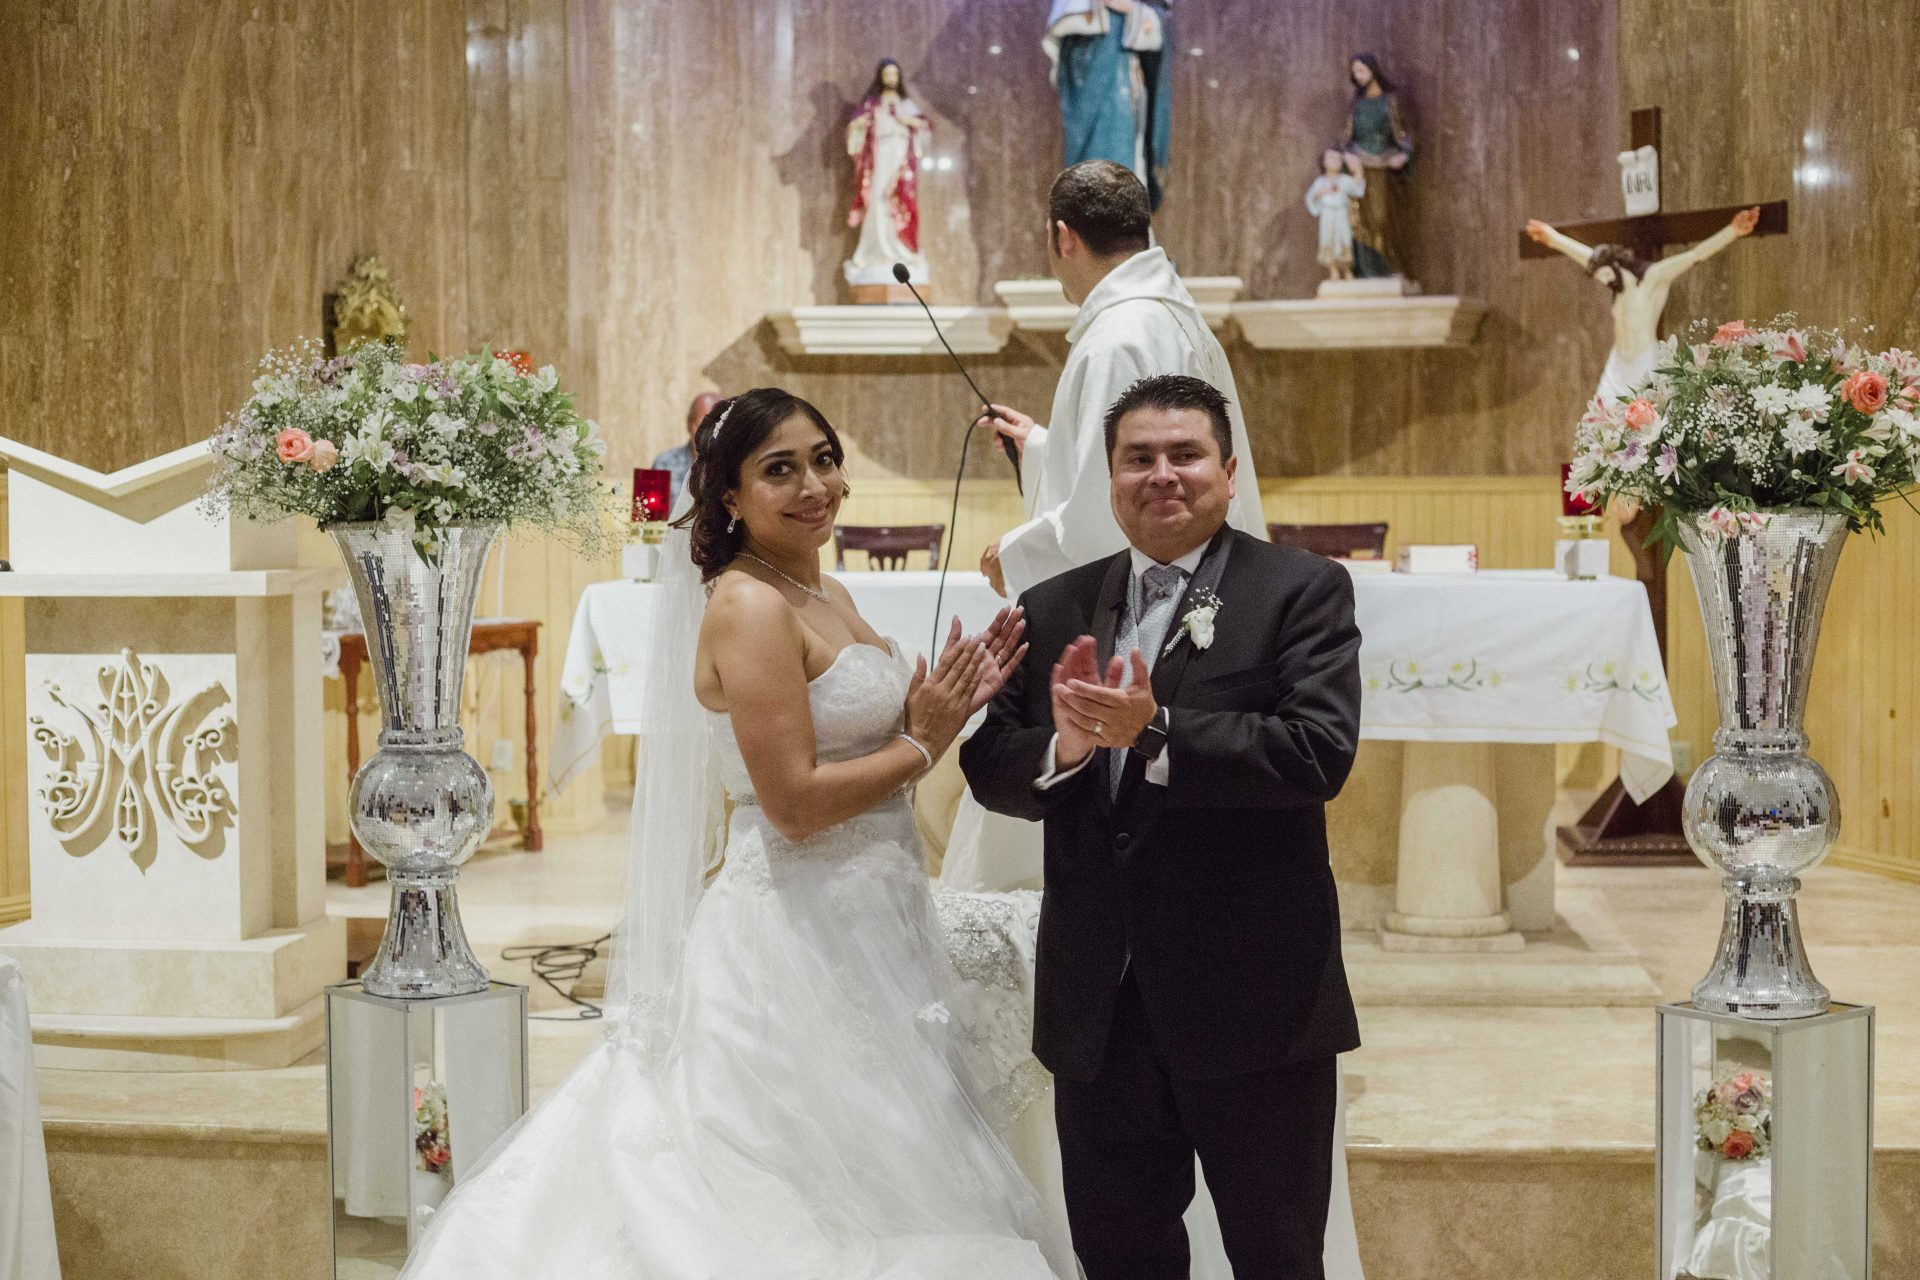 fotografo_profesional_zacatecas_chihuahua_bodas_xv_mexico-50